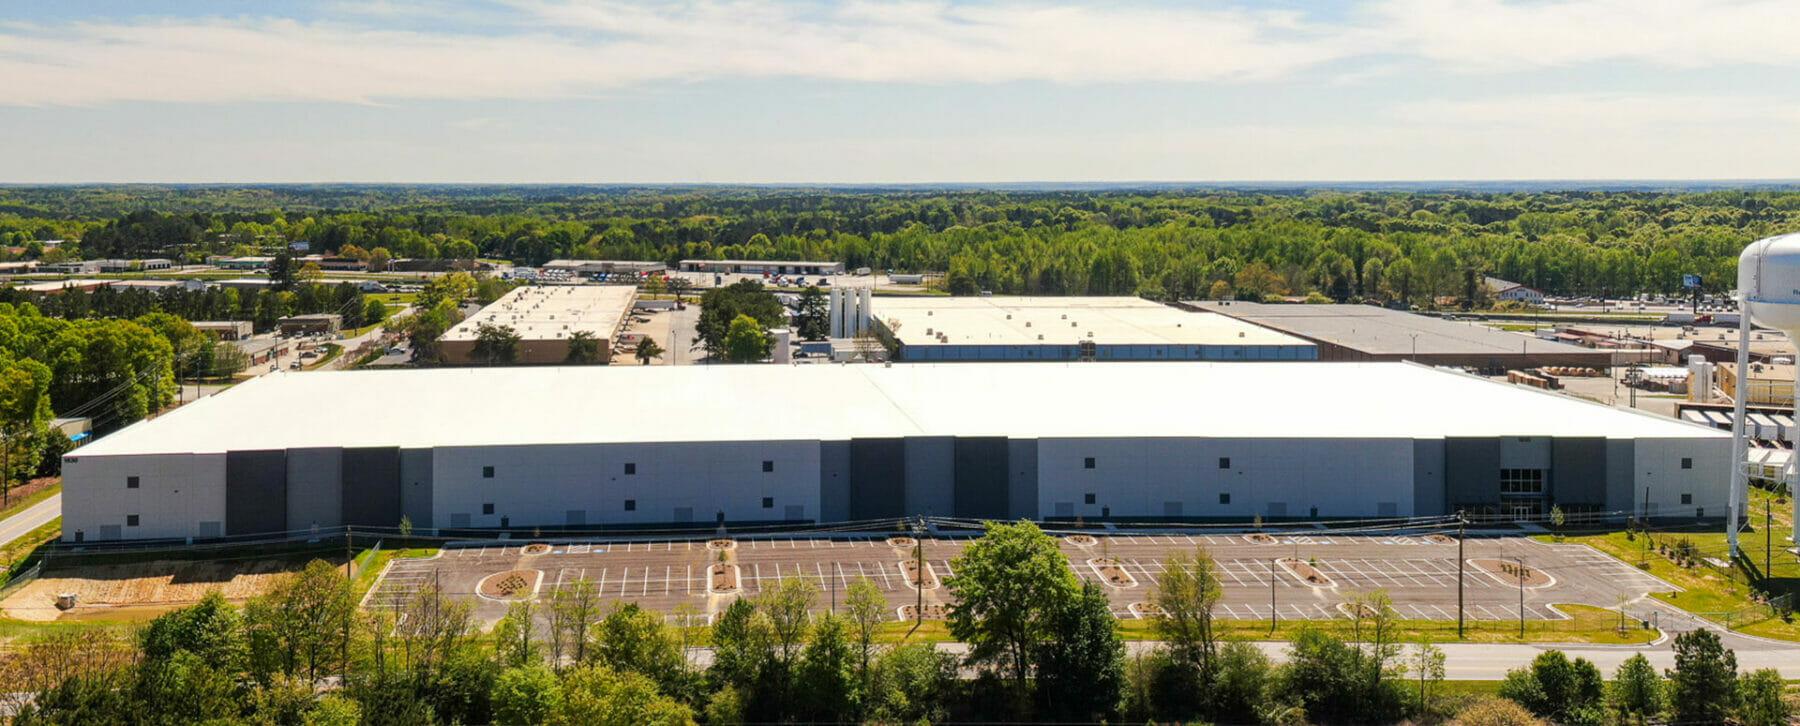 BioLab Warehouse - Conyers, GA 2